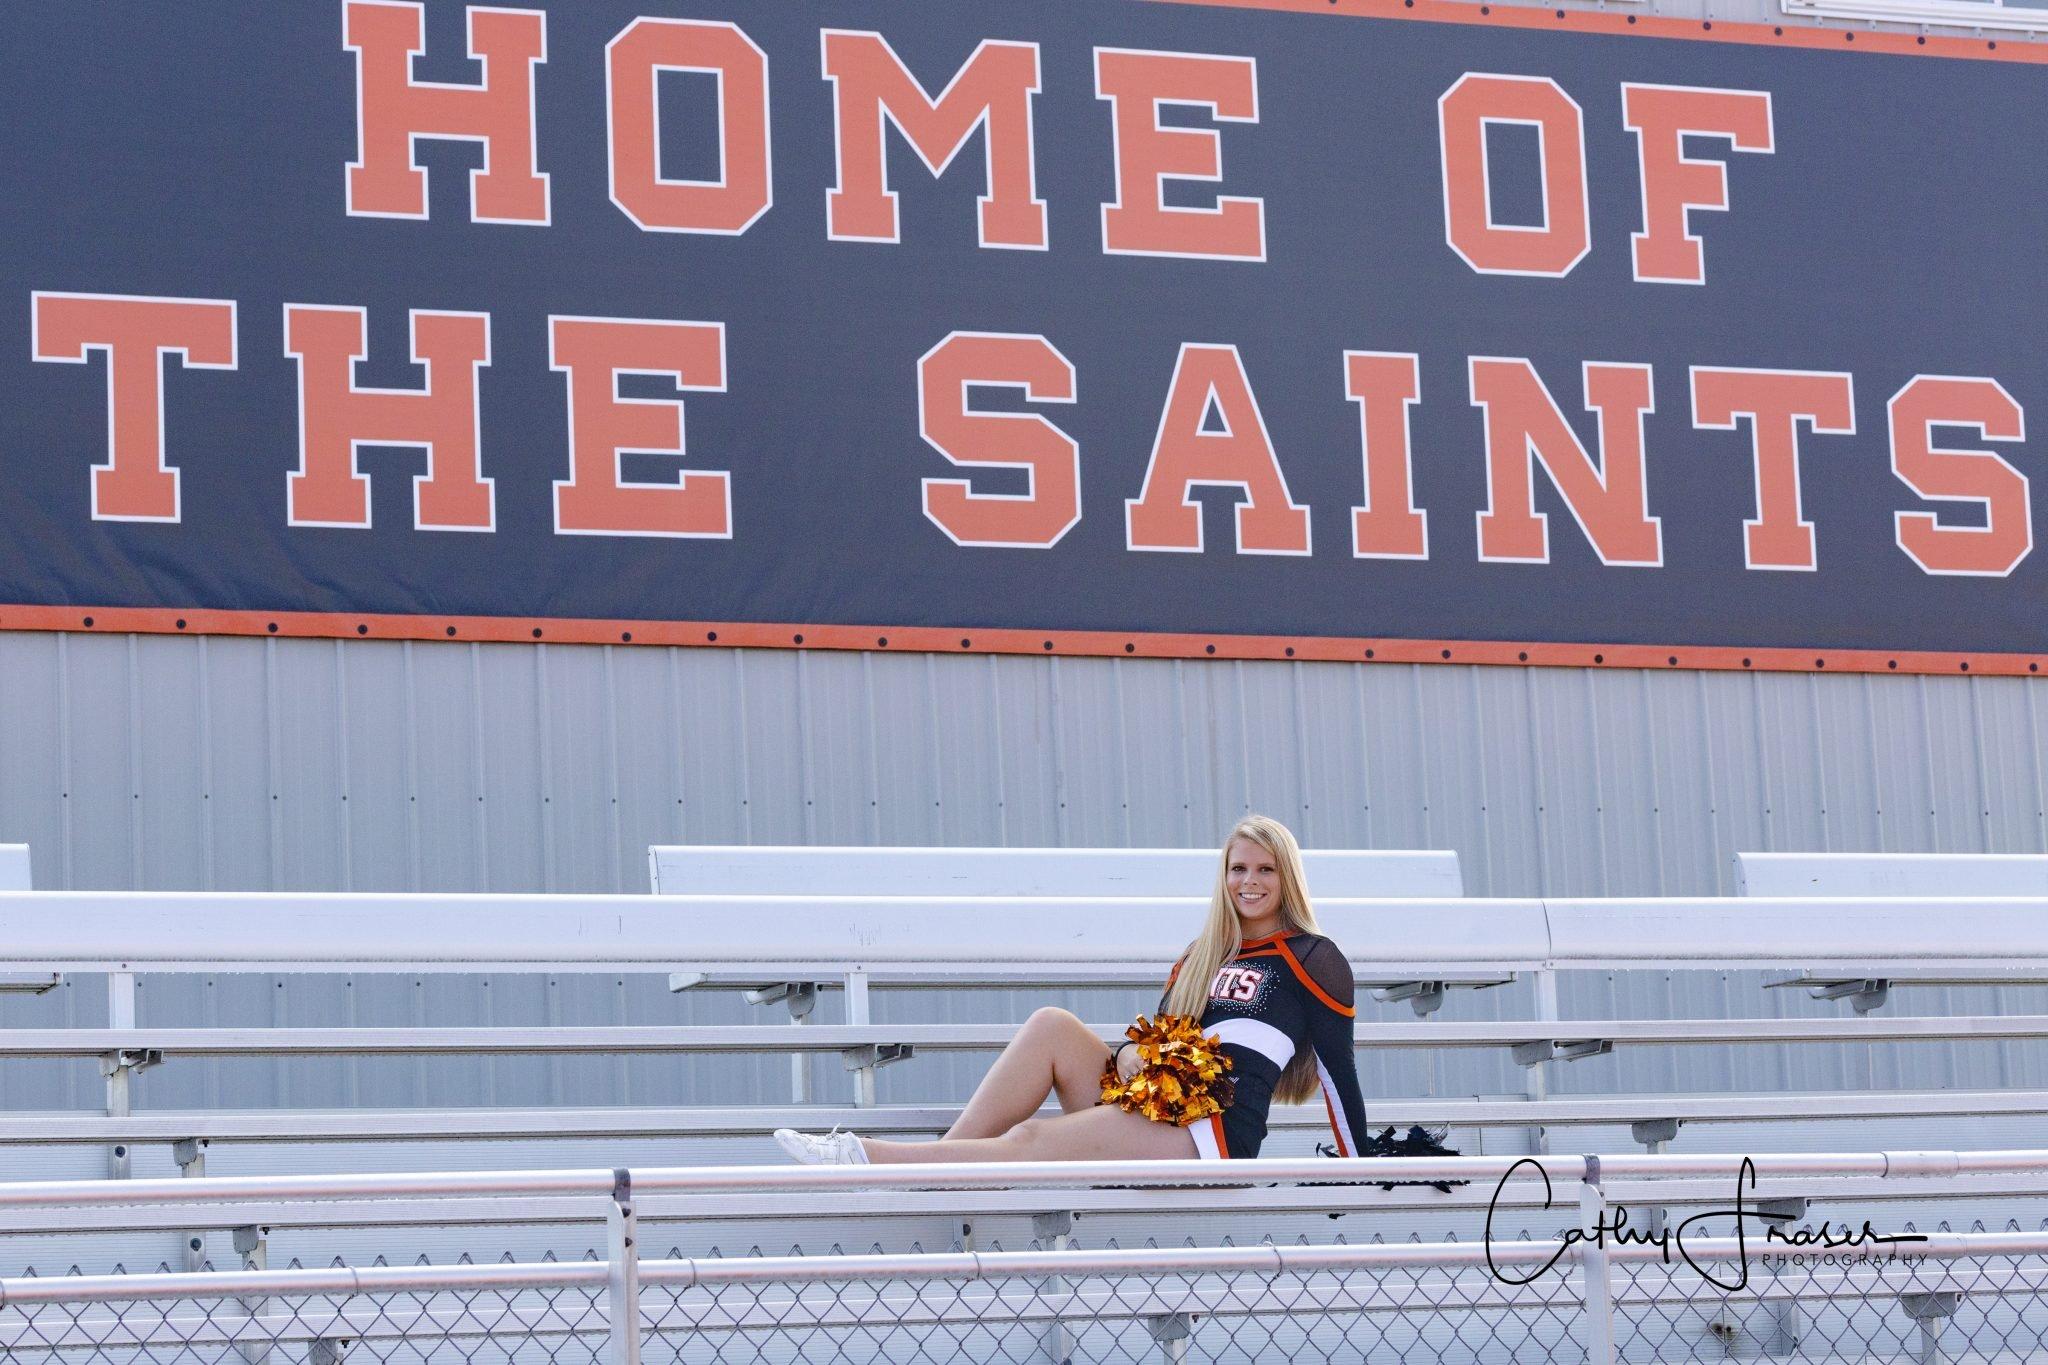 senior pictures, professional headshot, professional senior photos, Churchville, New York, cheerleader, professional cheerleading pictures